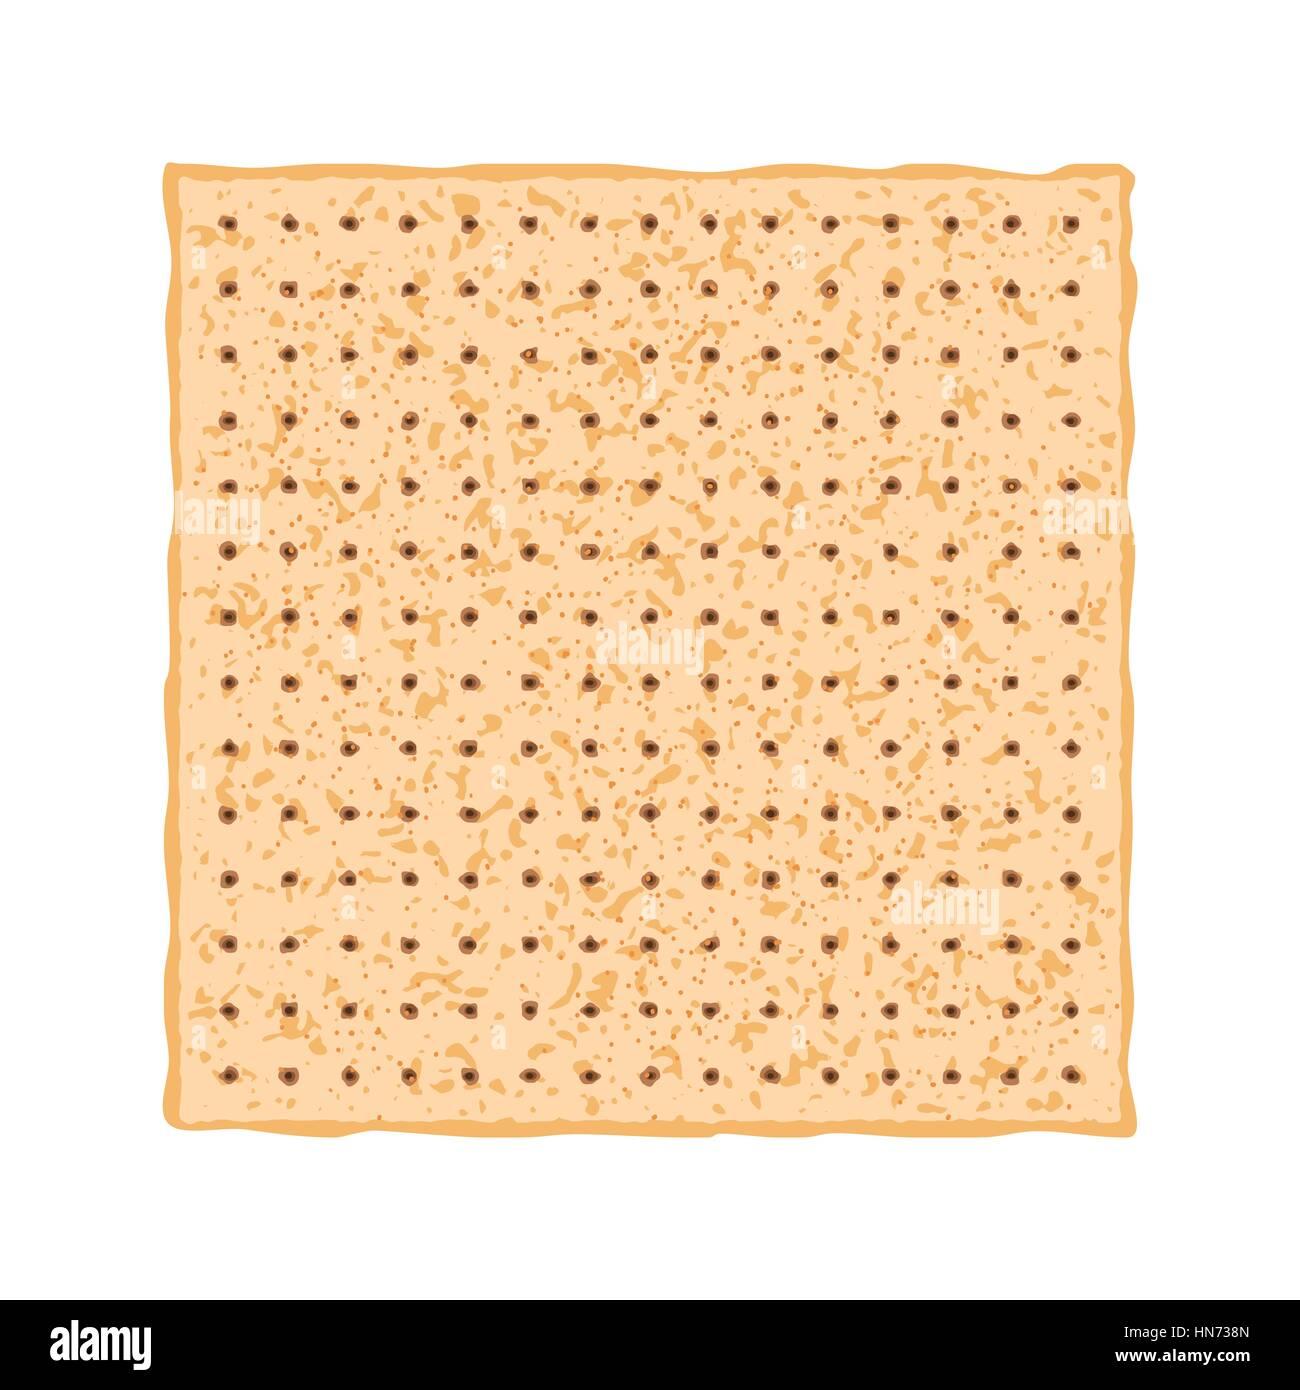 Vector illustration of Matzo. Matza from the Jewish holiday Passover. - Stock Image